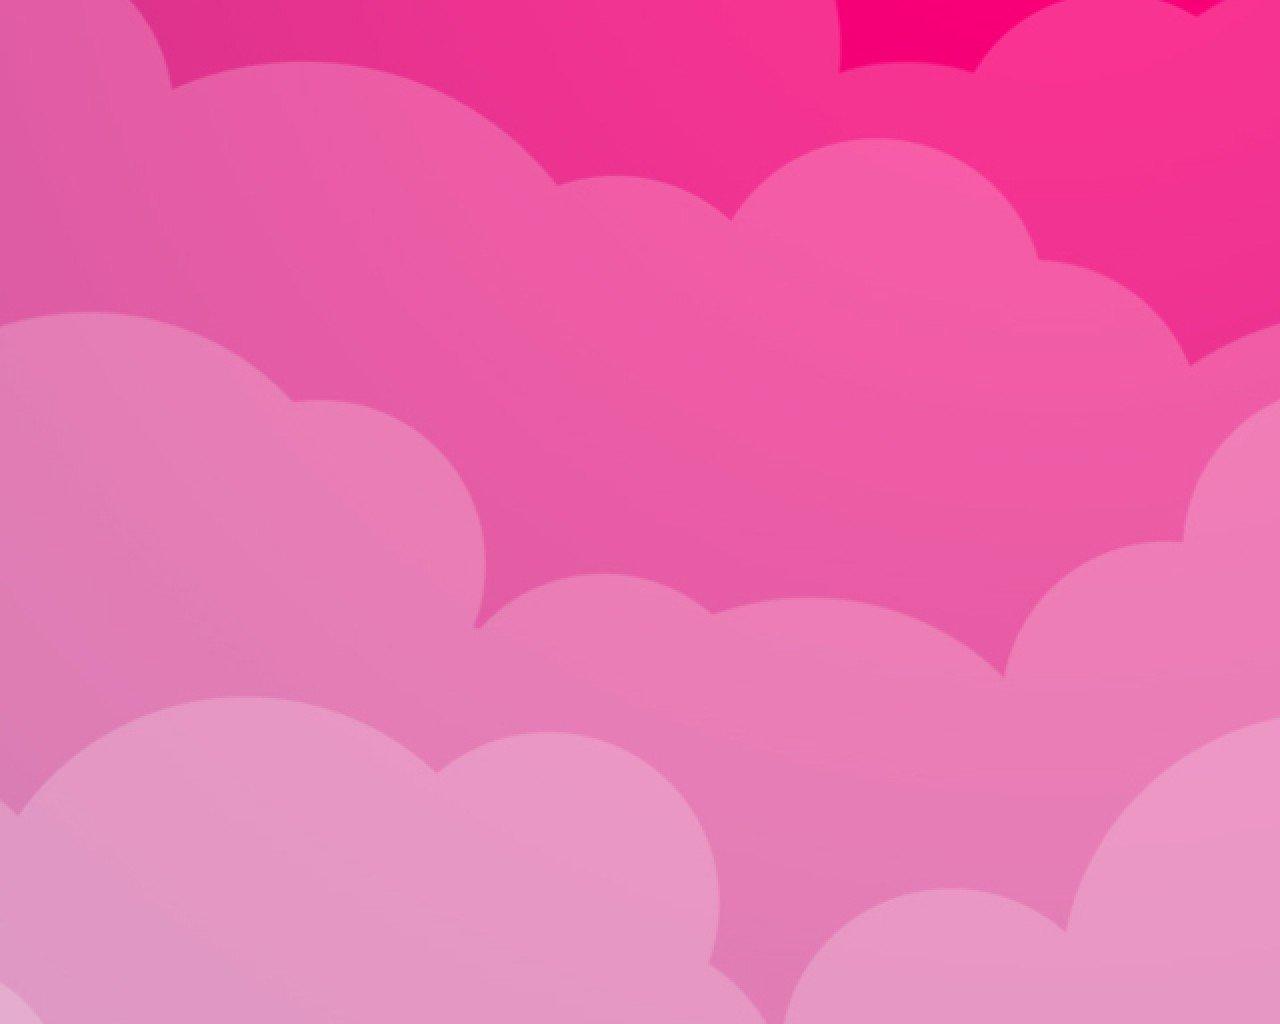 Pics Photos   Cute Pink Snoopy Hd Iphone Wallpaper 1280x1024